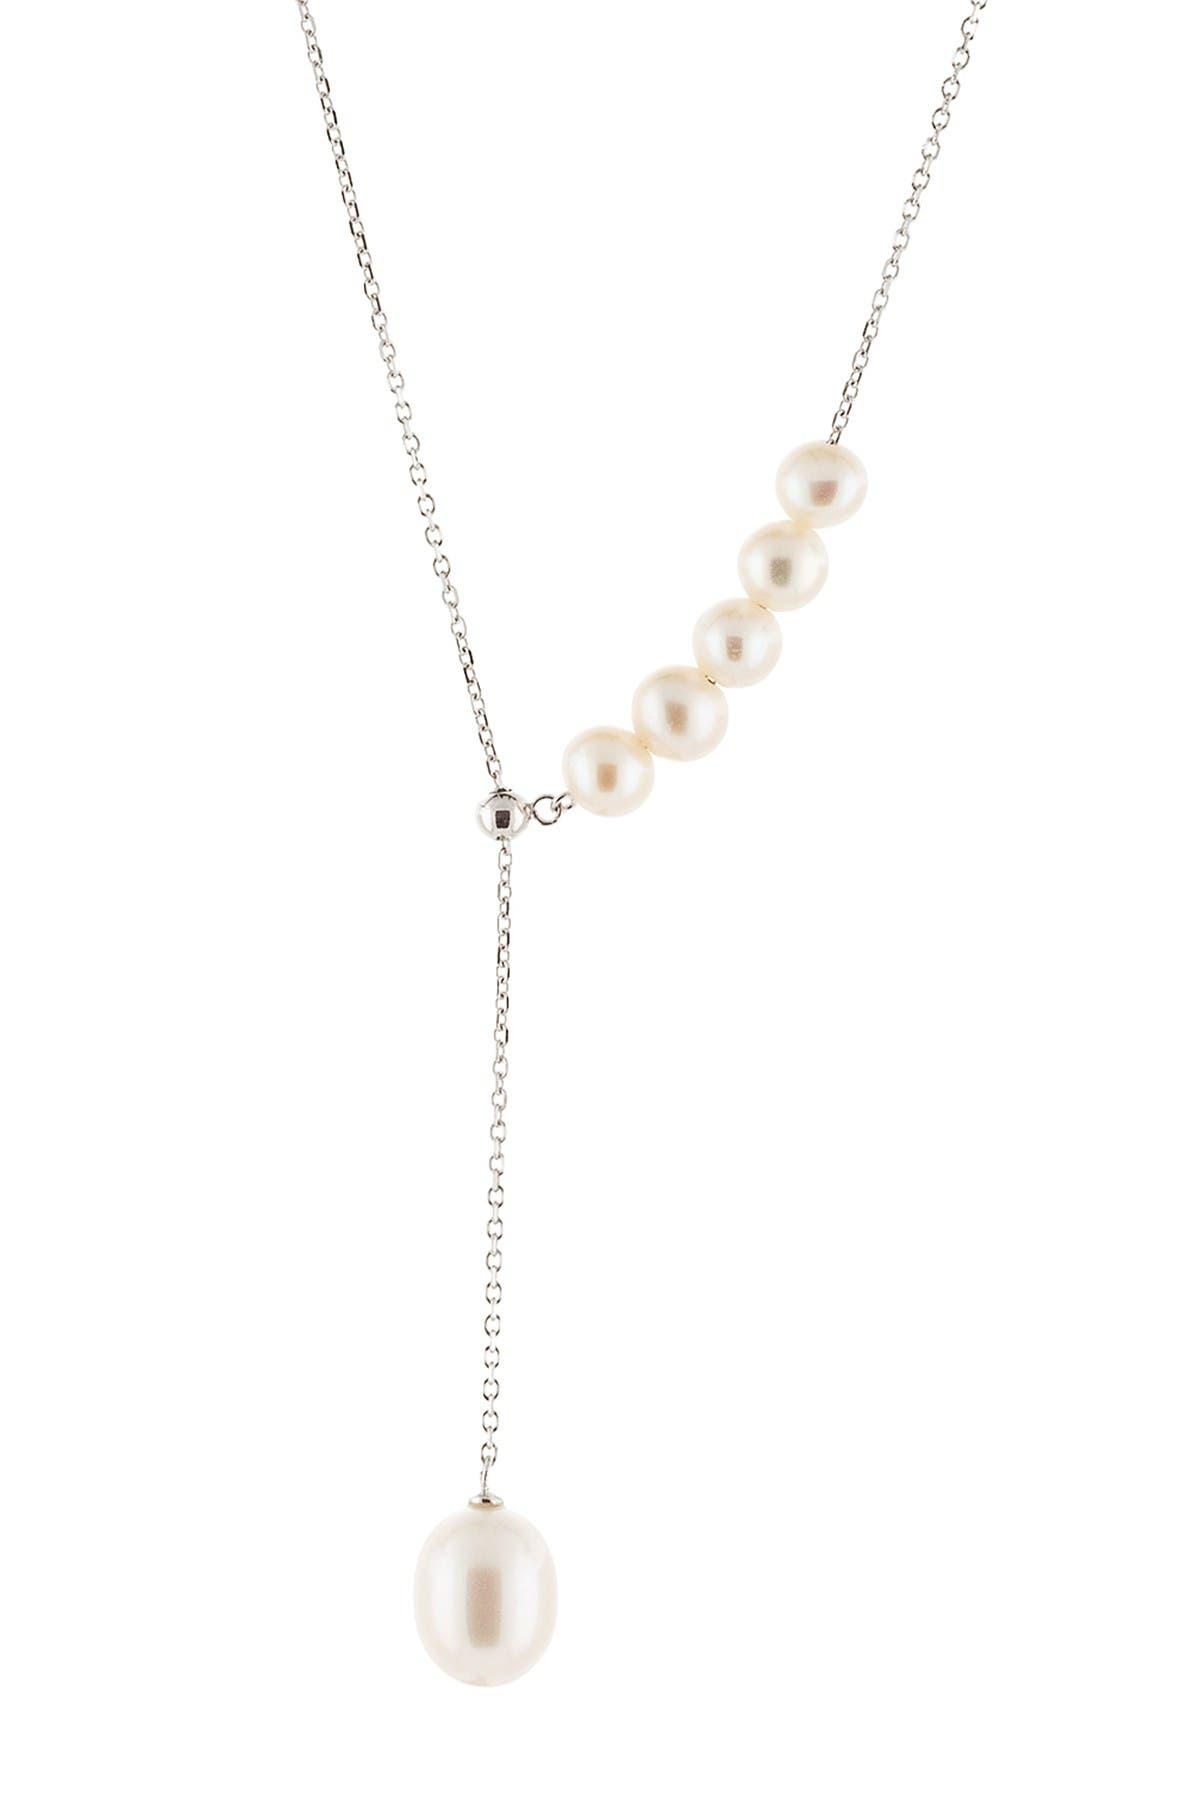 Splendid Pearls Dangling 8-8.5mm Cultured Freshwater Pearl Slider Necklace at Nordstrom Rack